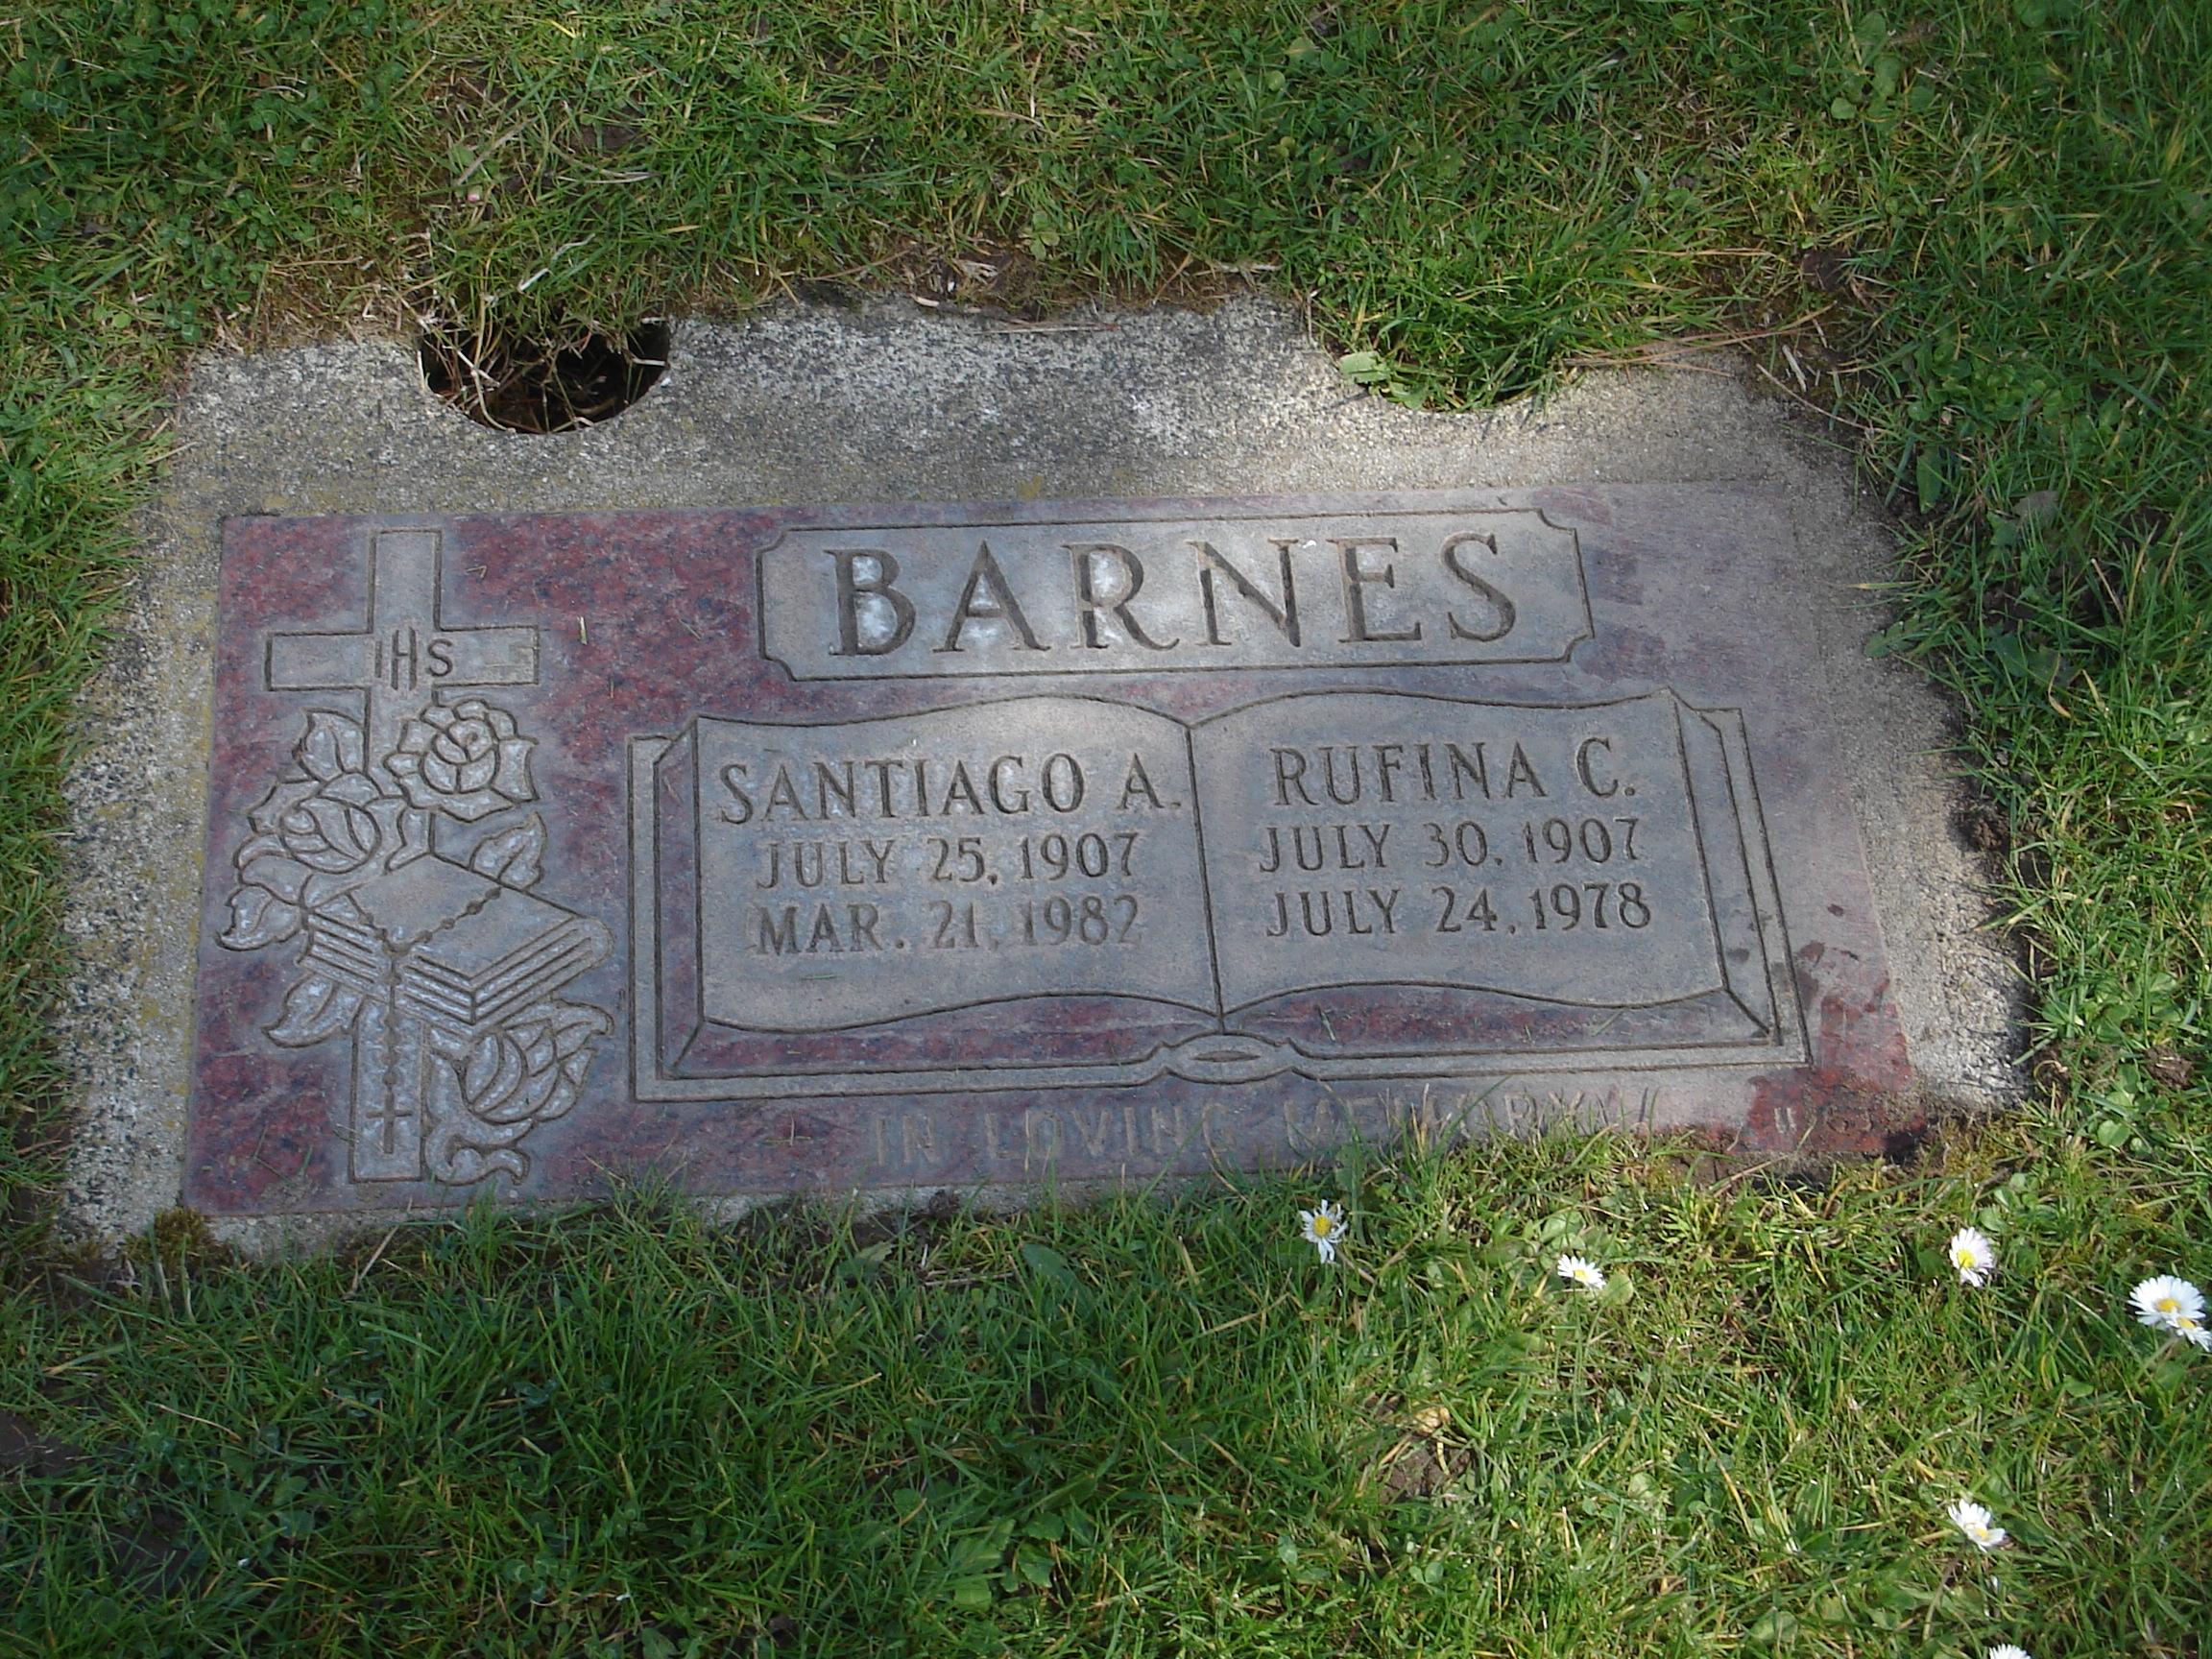 Santiago A James or Johnny Barnes